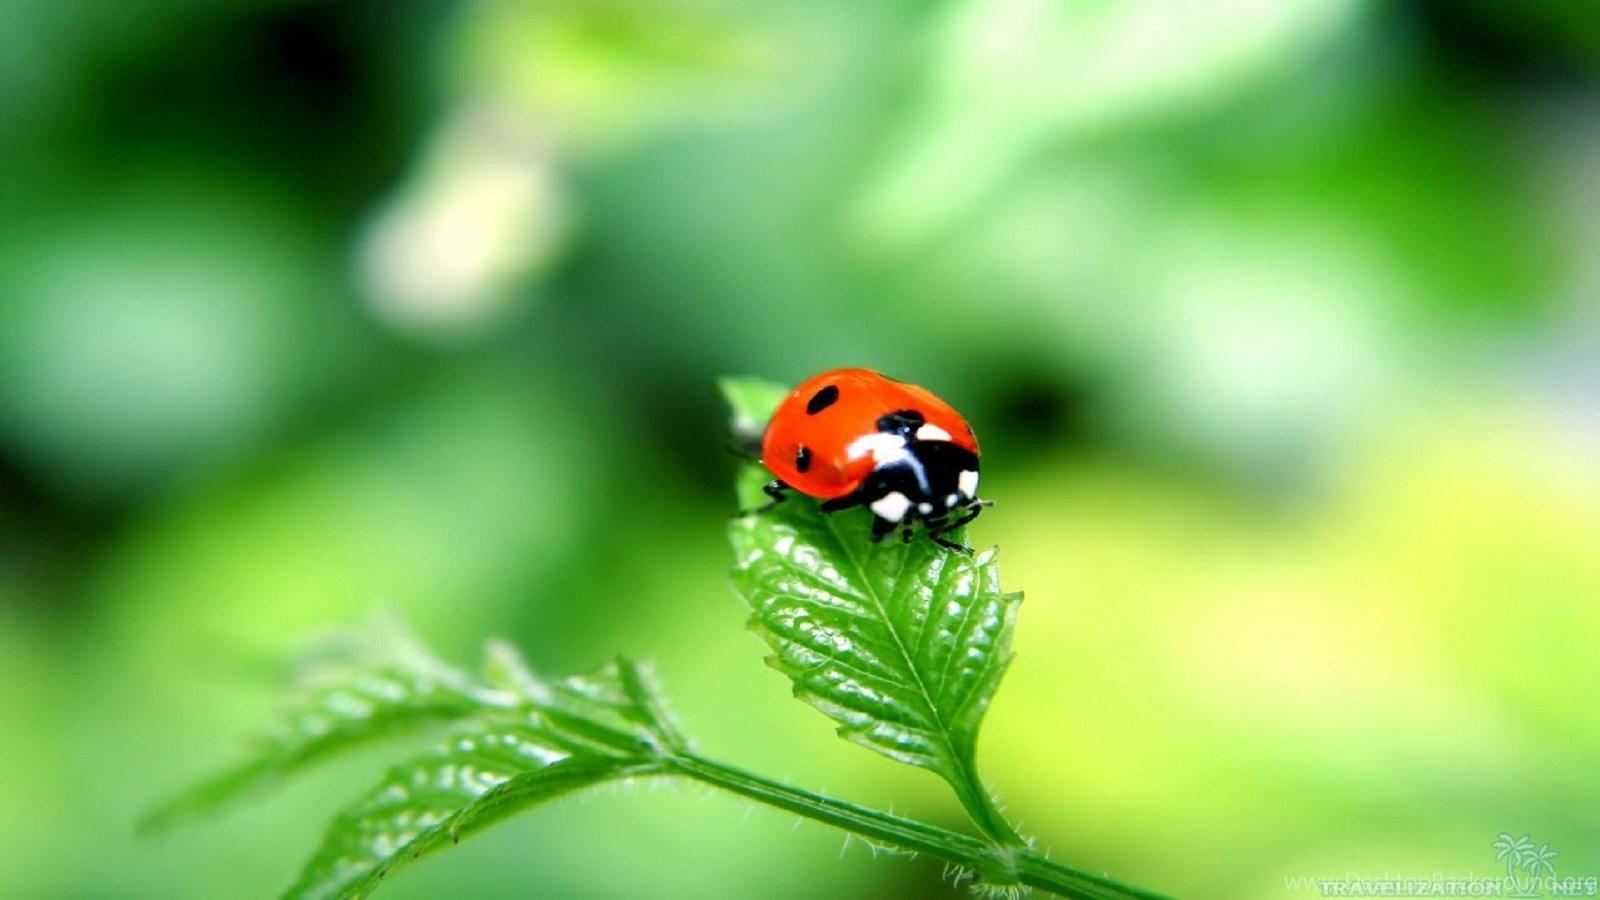 Ladybug Wallpapers Desktop Background